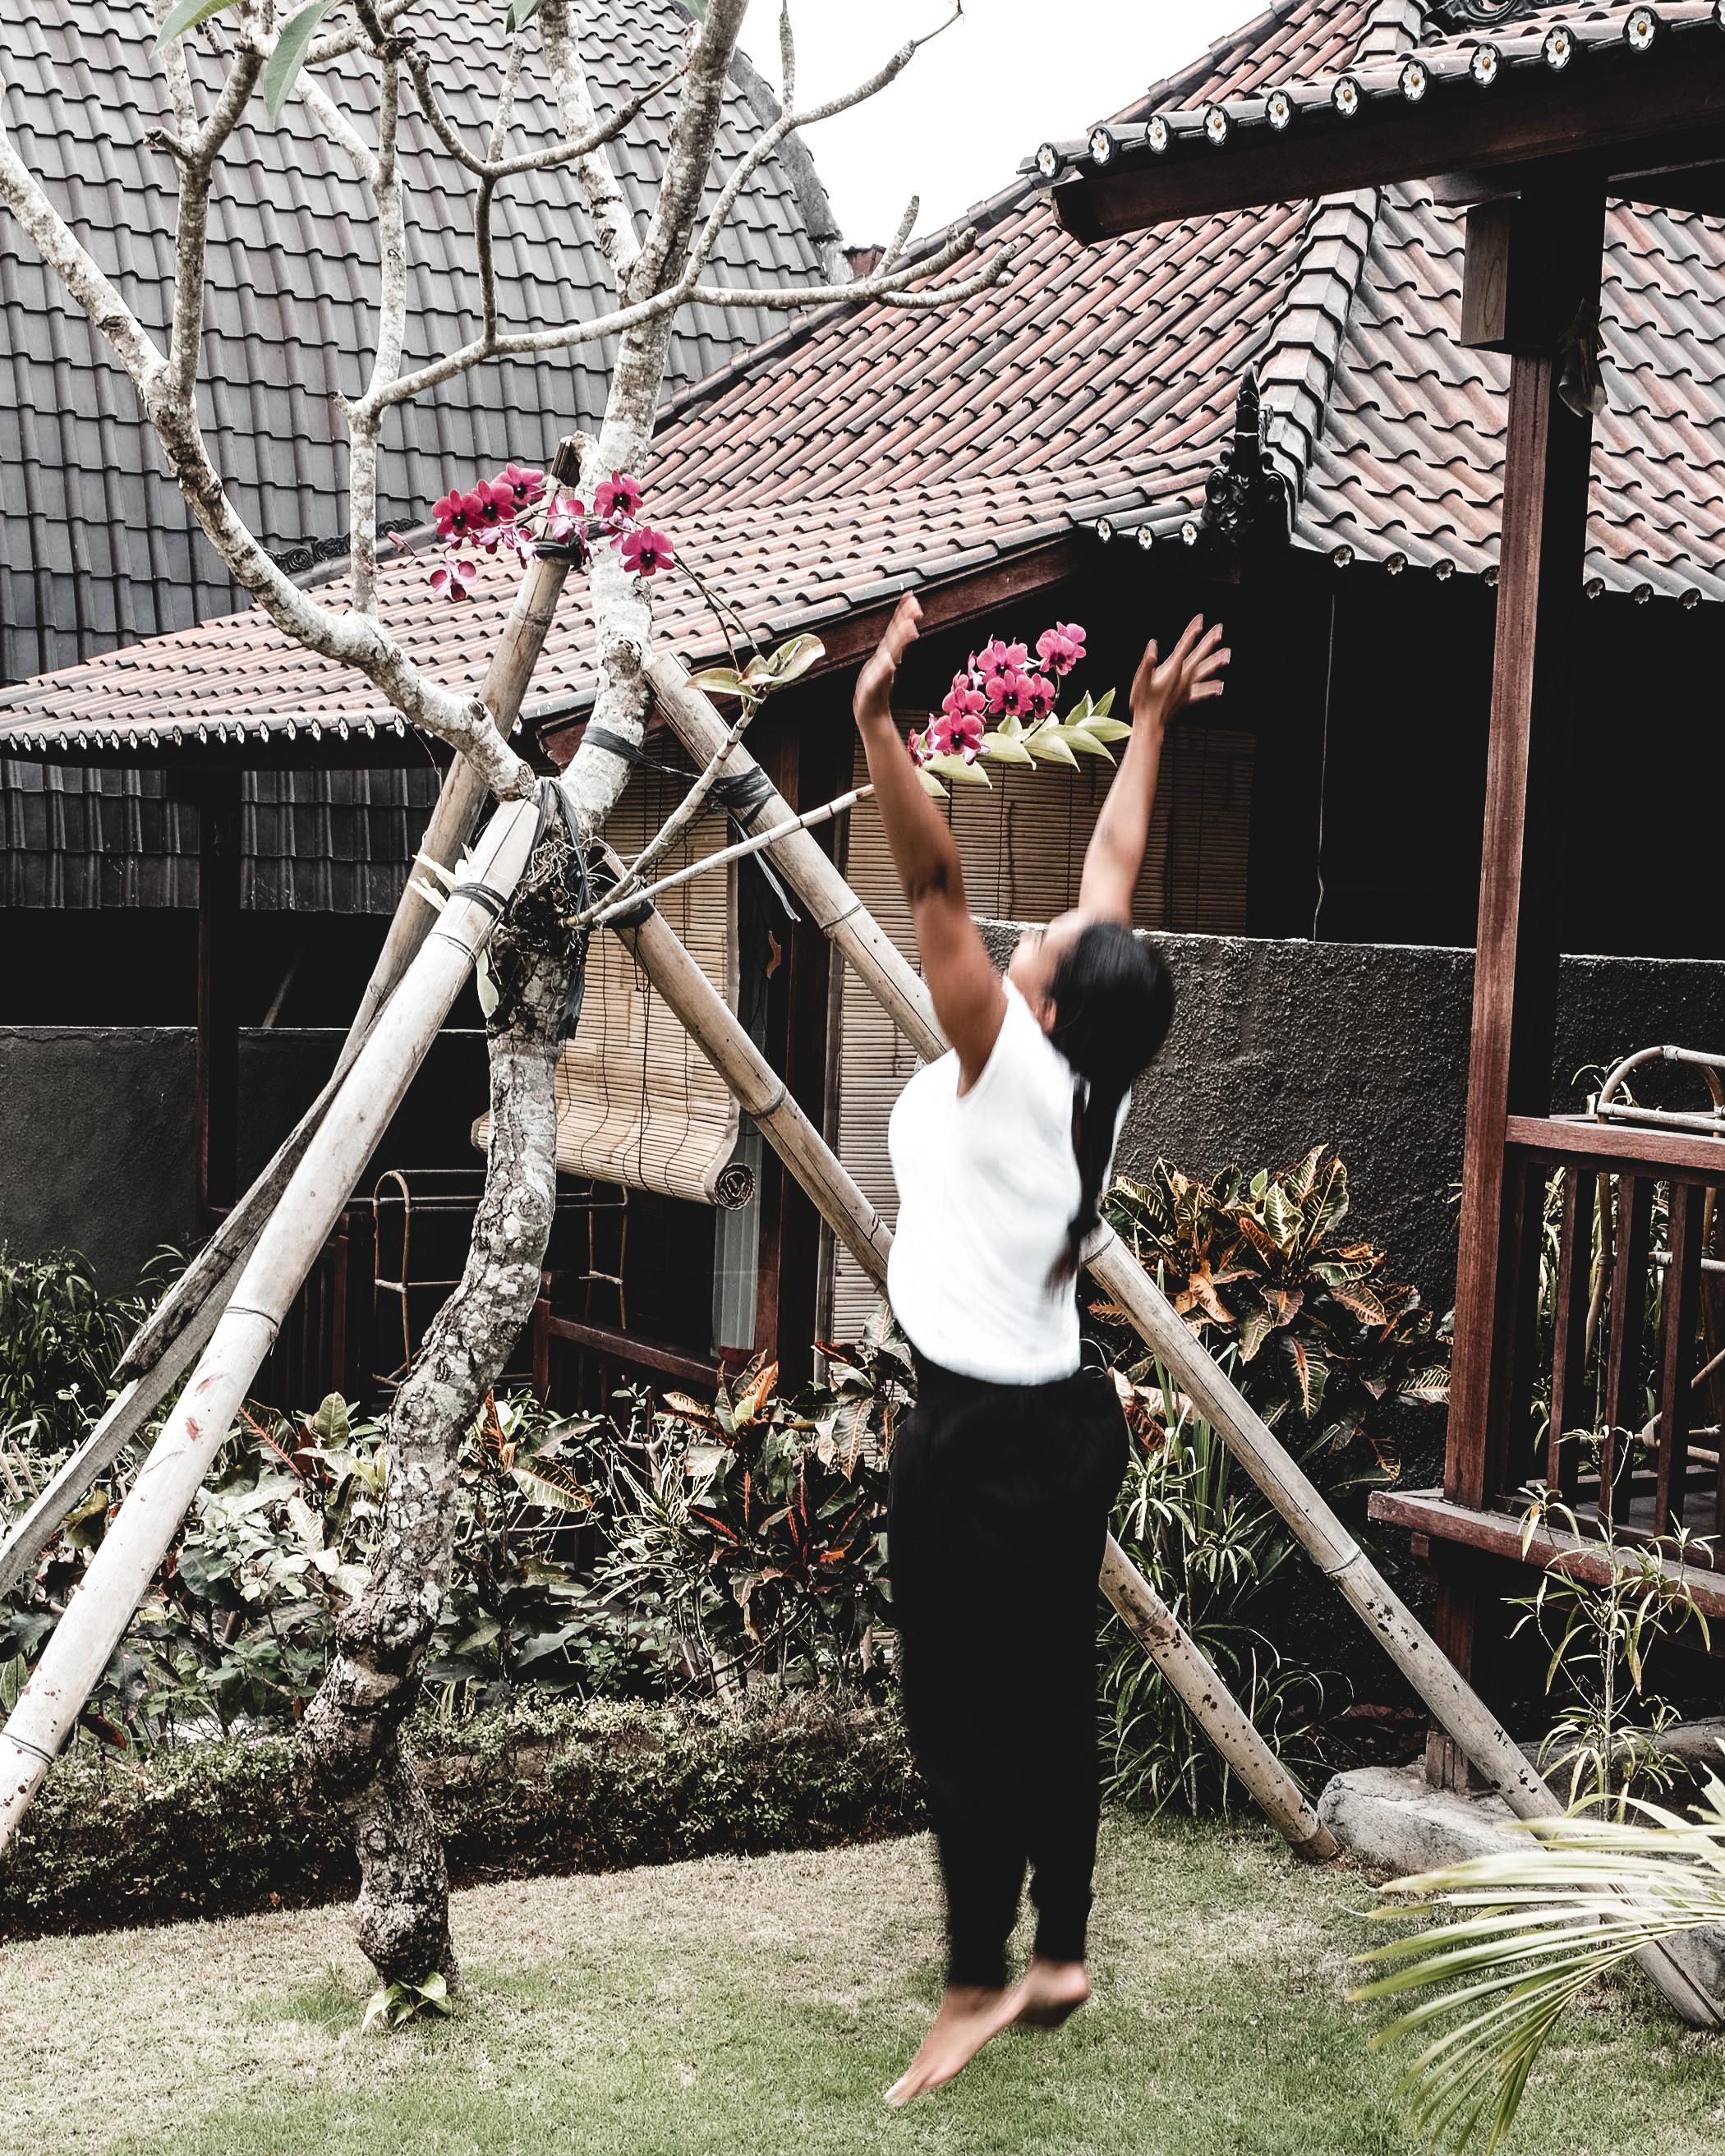 Hotel review Puri Pandawa Resort in Uluwatu, Bali. travel Blogger visiting. Imparfait Fail of Instagram & Still Learning, creative entrepreneur tips instagram